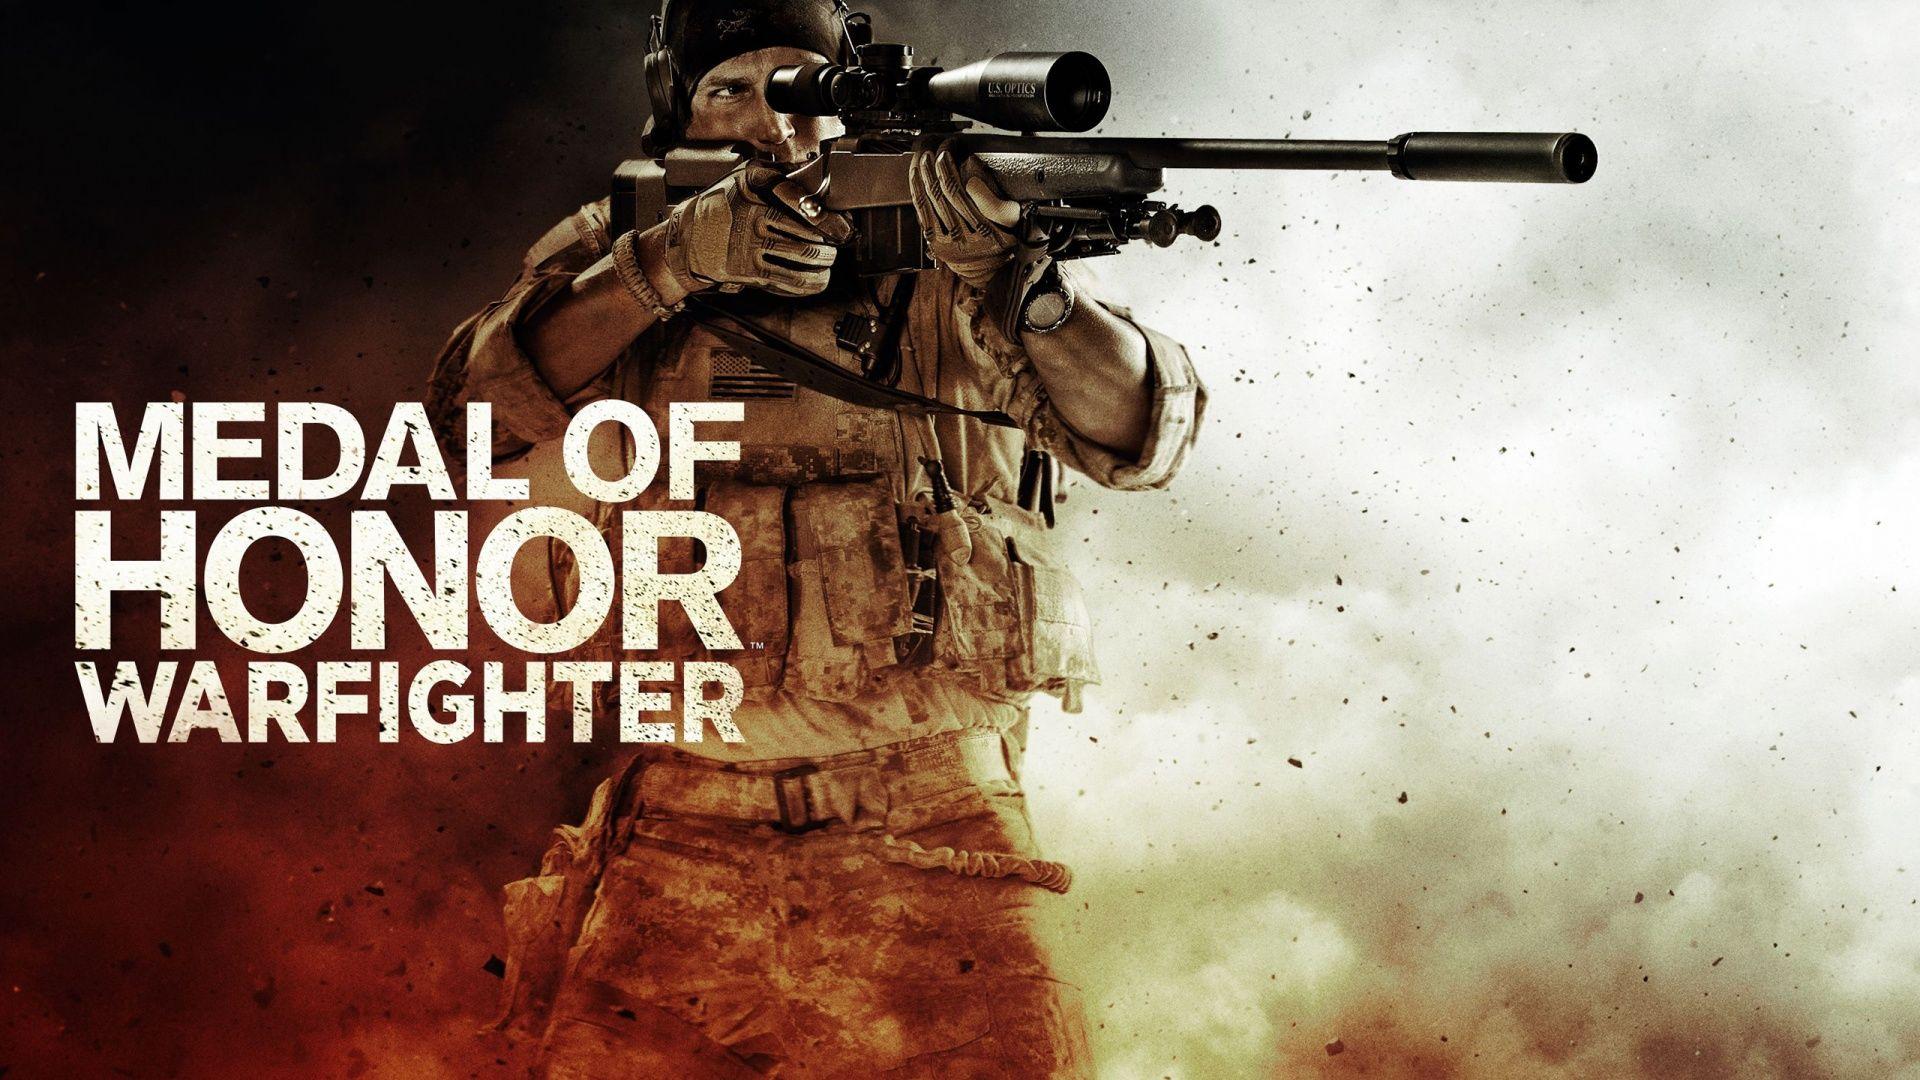 Hd wallpaper games - Medal Of Honor Warfighter Category Wallpaper Images Medal Of Honor Warfighter